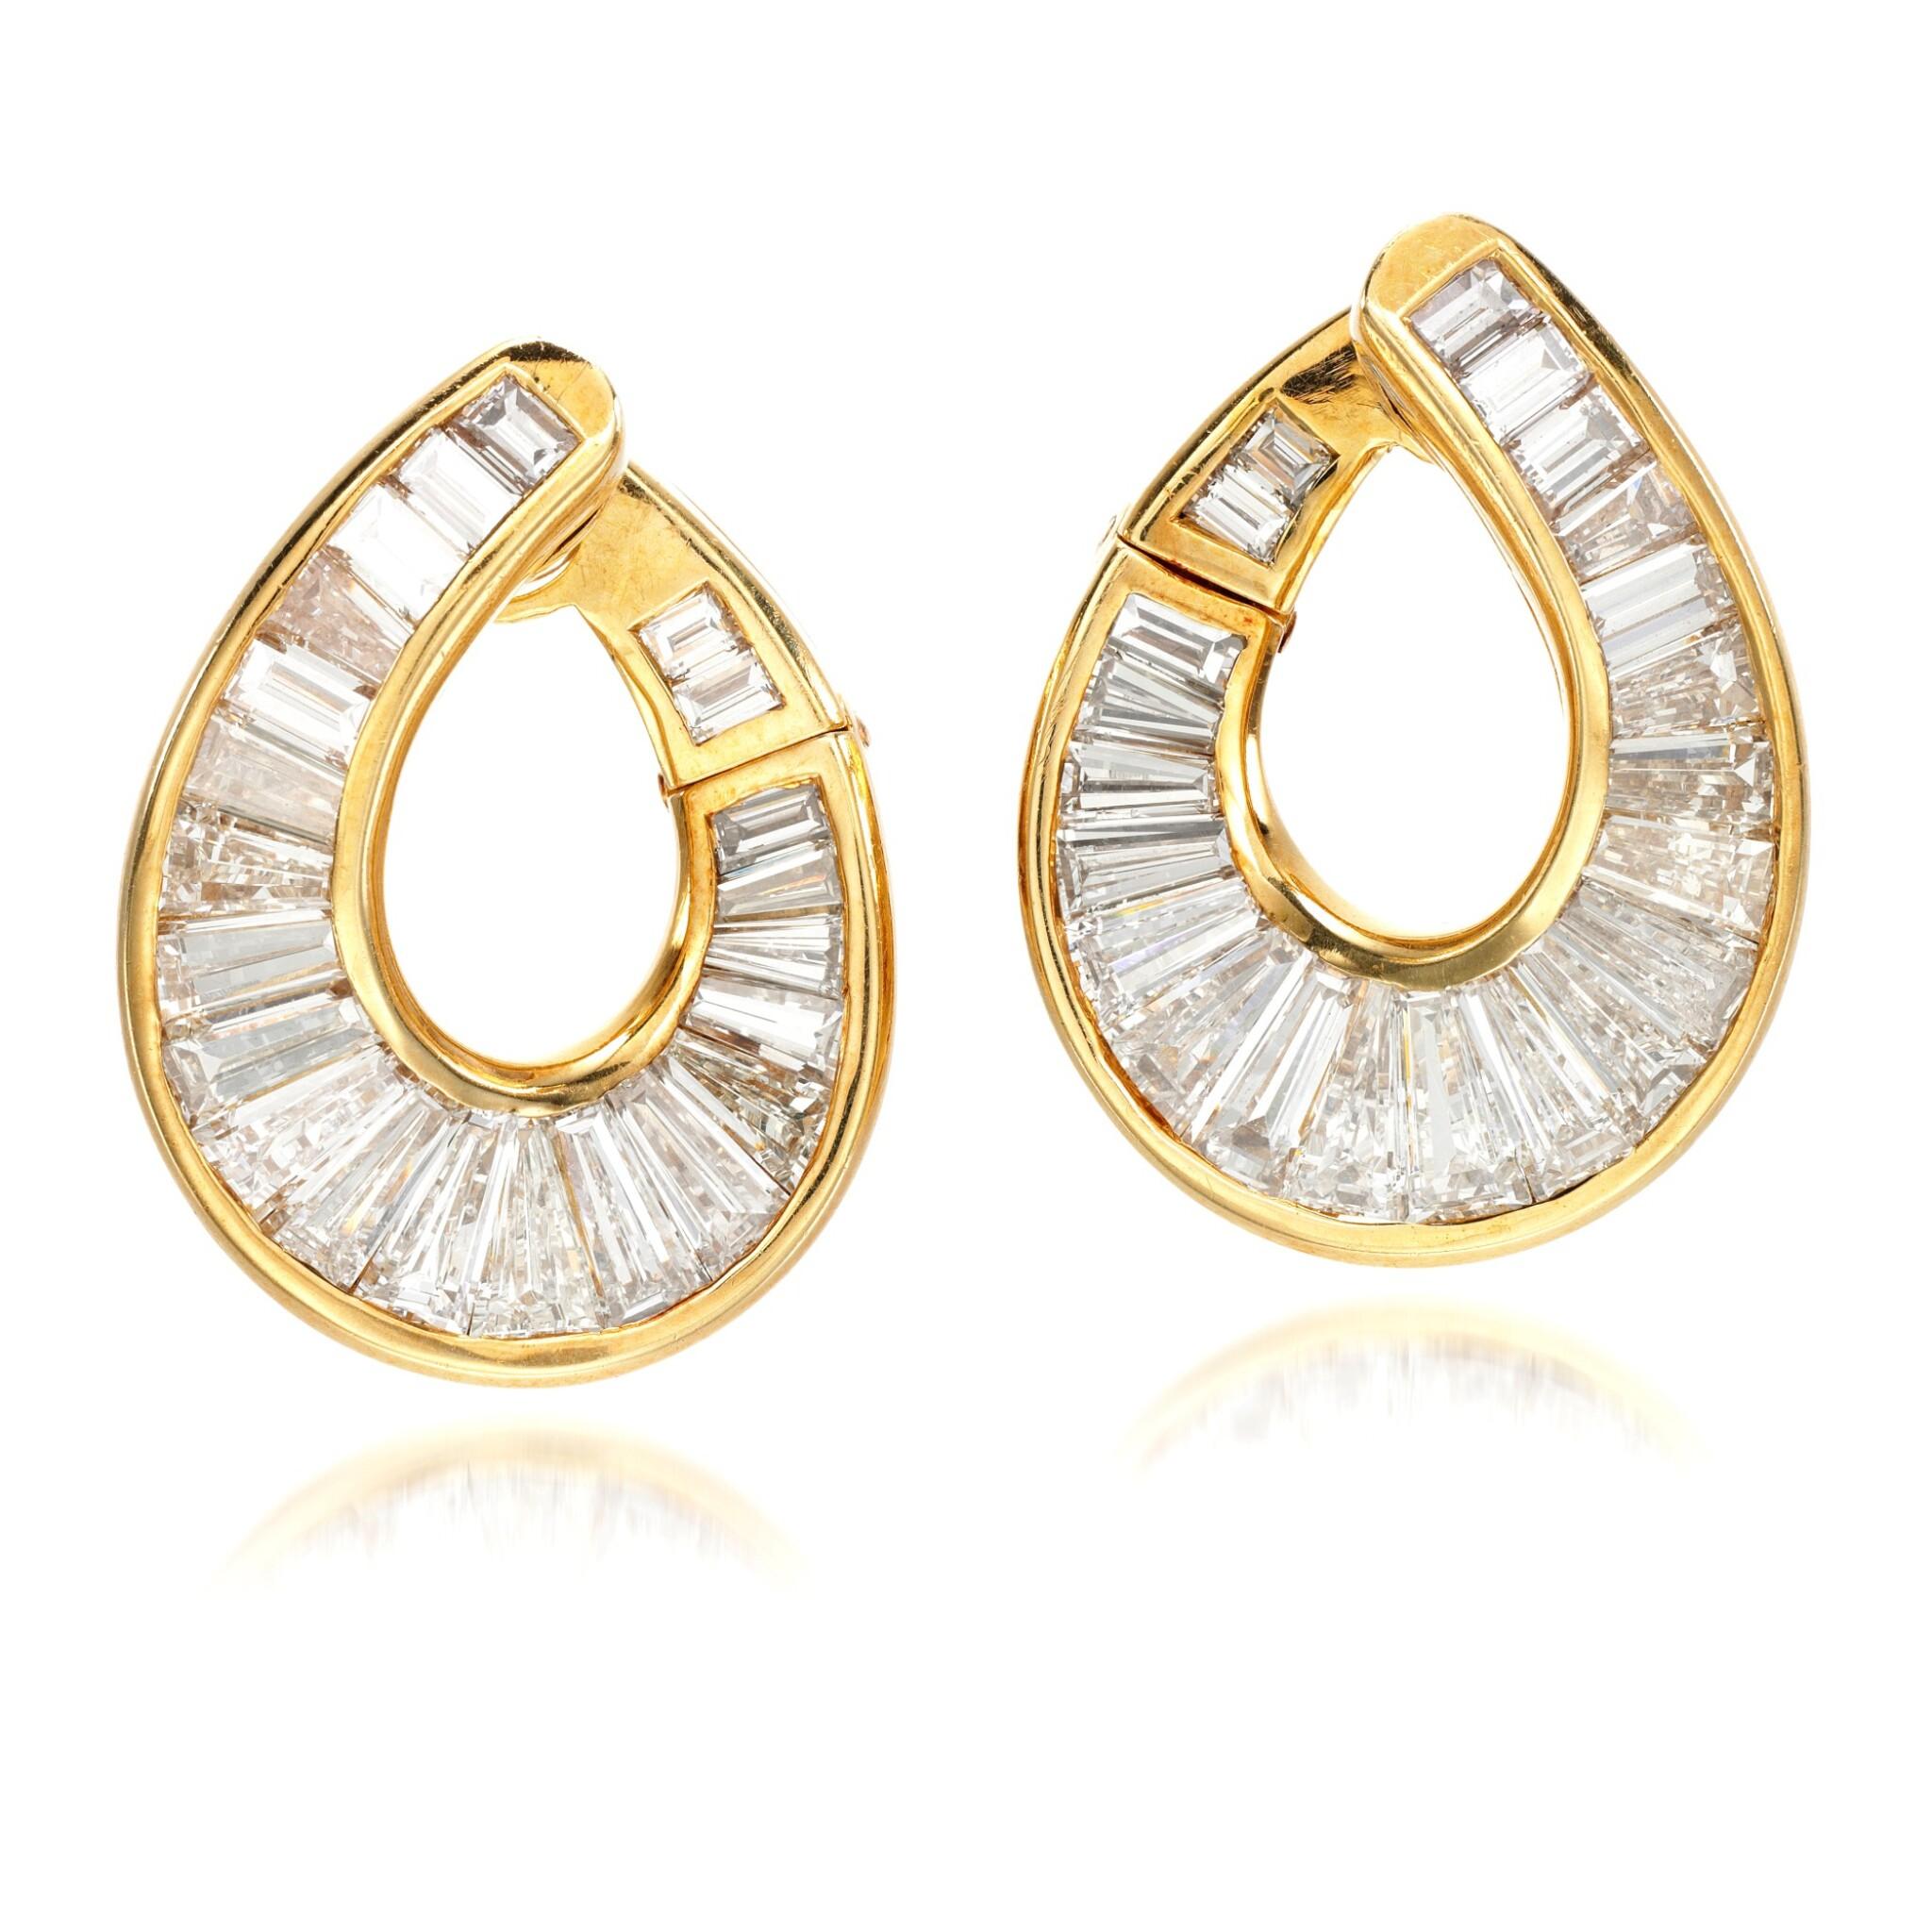 View full screen - View 1 of Lot 70. Pair of diamond earrings.